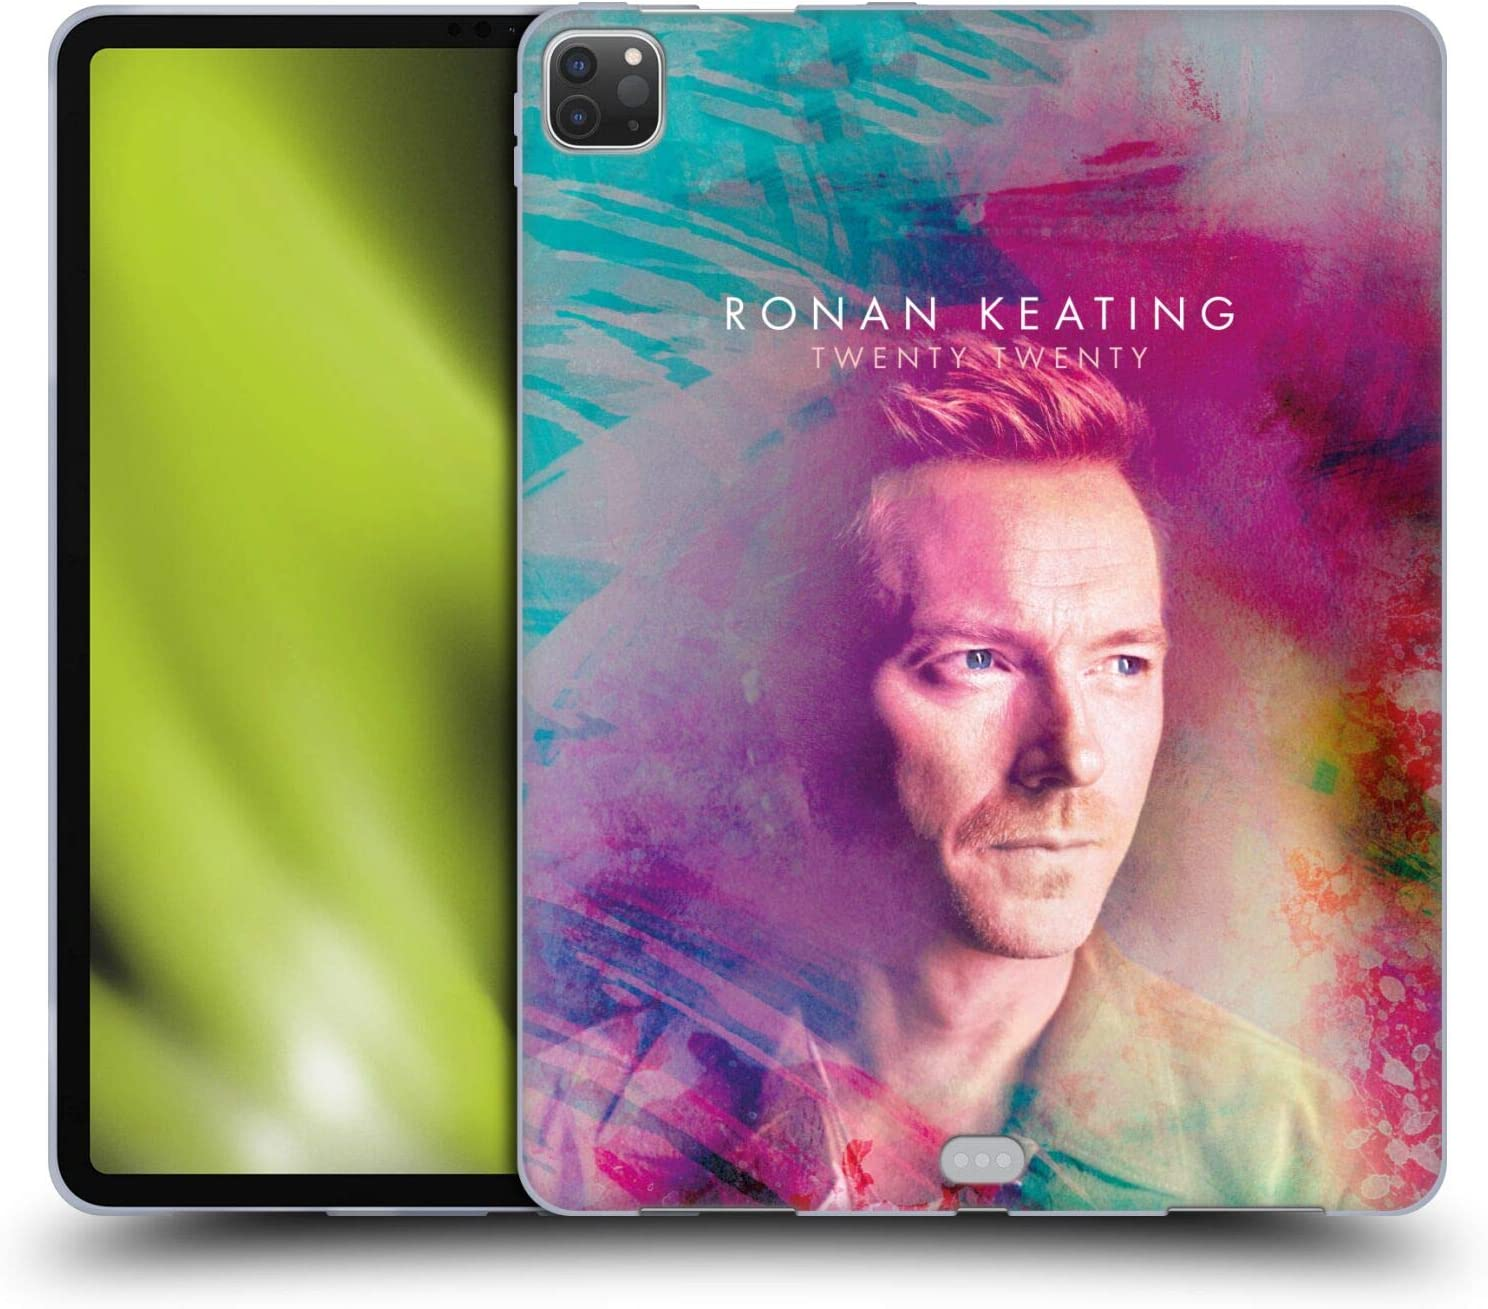 Head Case Designs Officially Licensed Ronan Keating Key Art Twenty Twenty Soft Gel Case Compatible with Apple iPad Pro 12.9 (2020 / 2021)